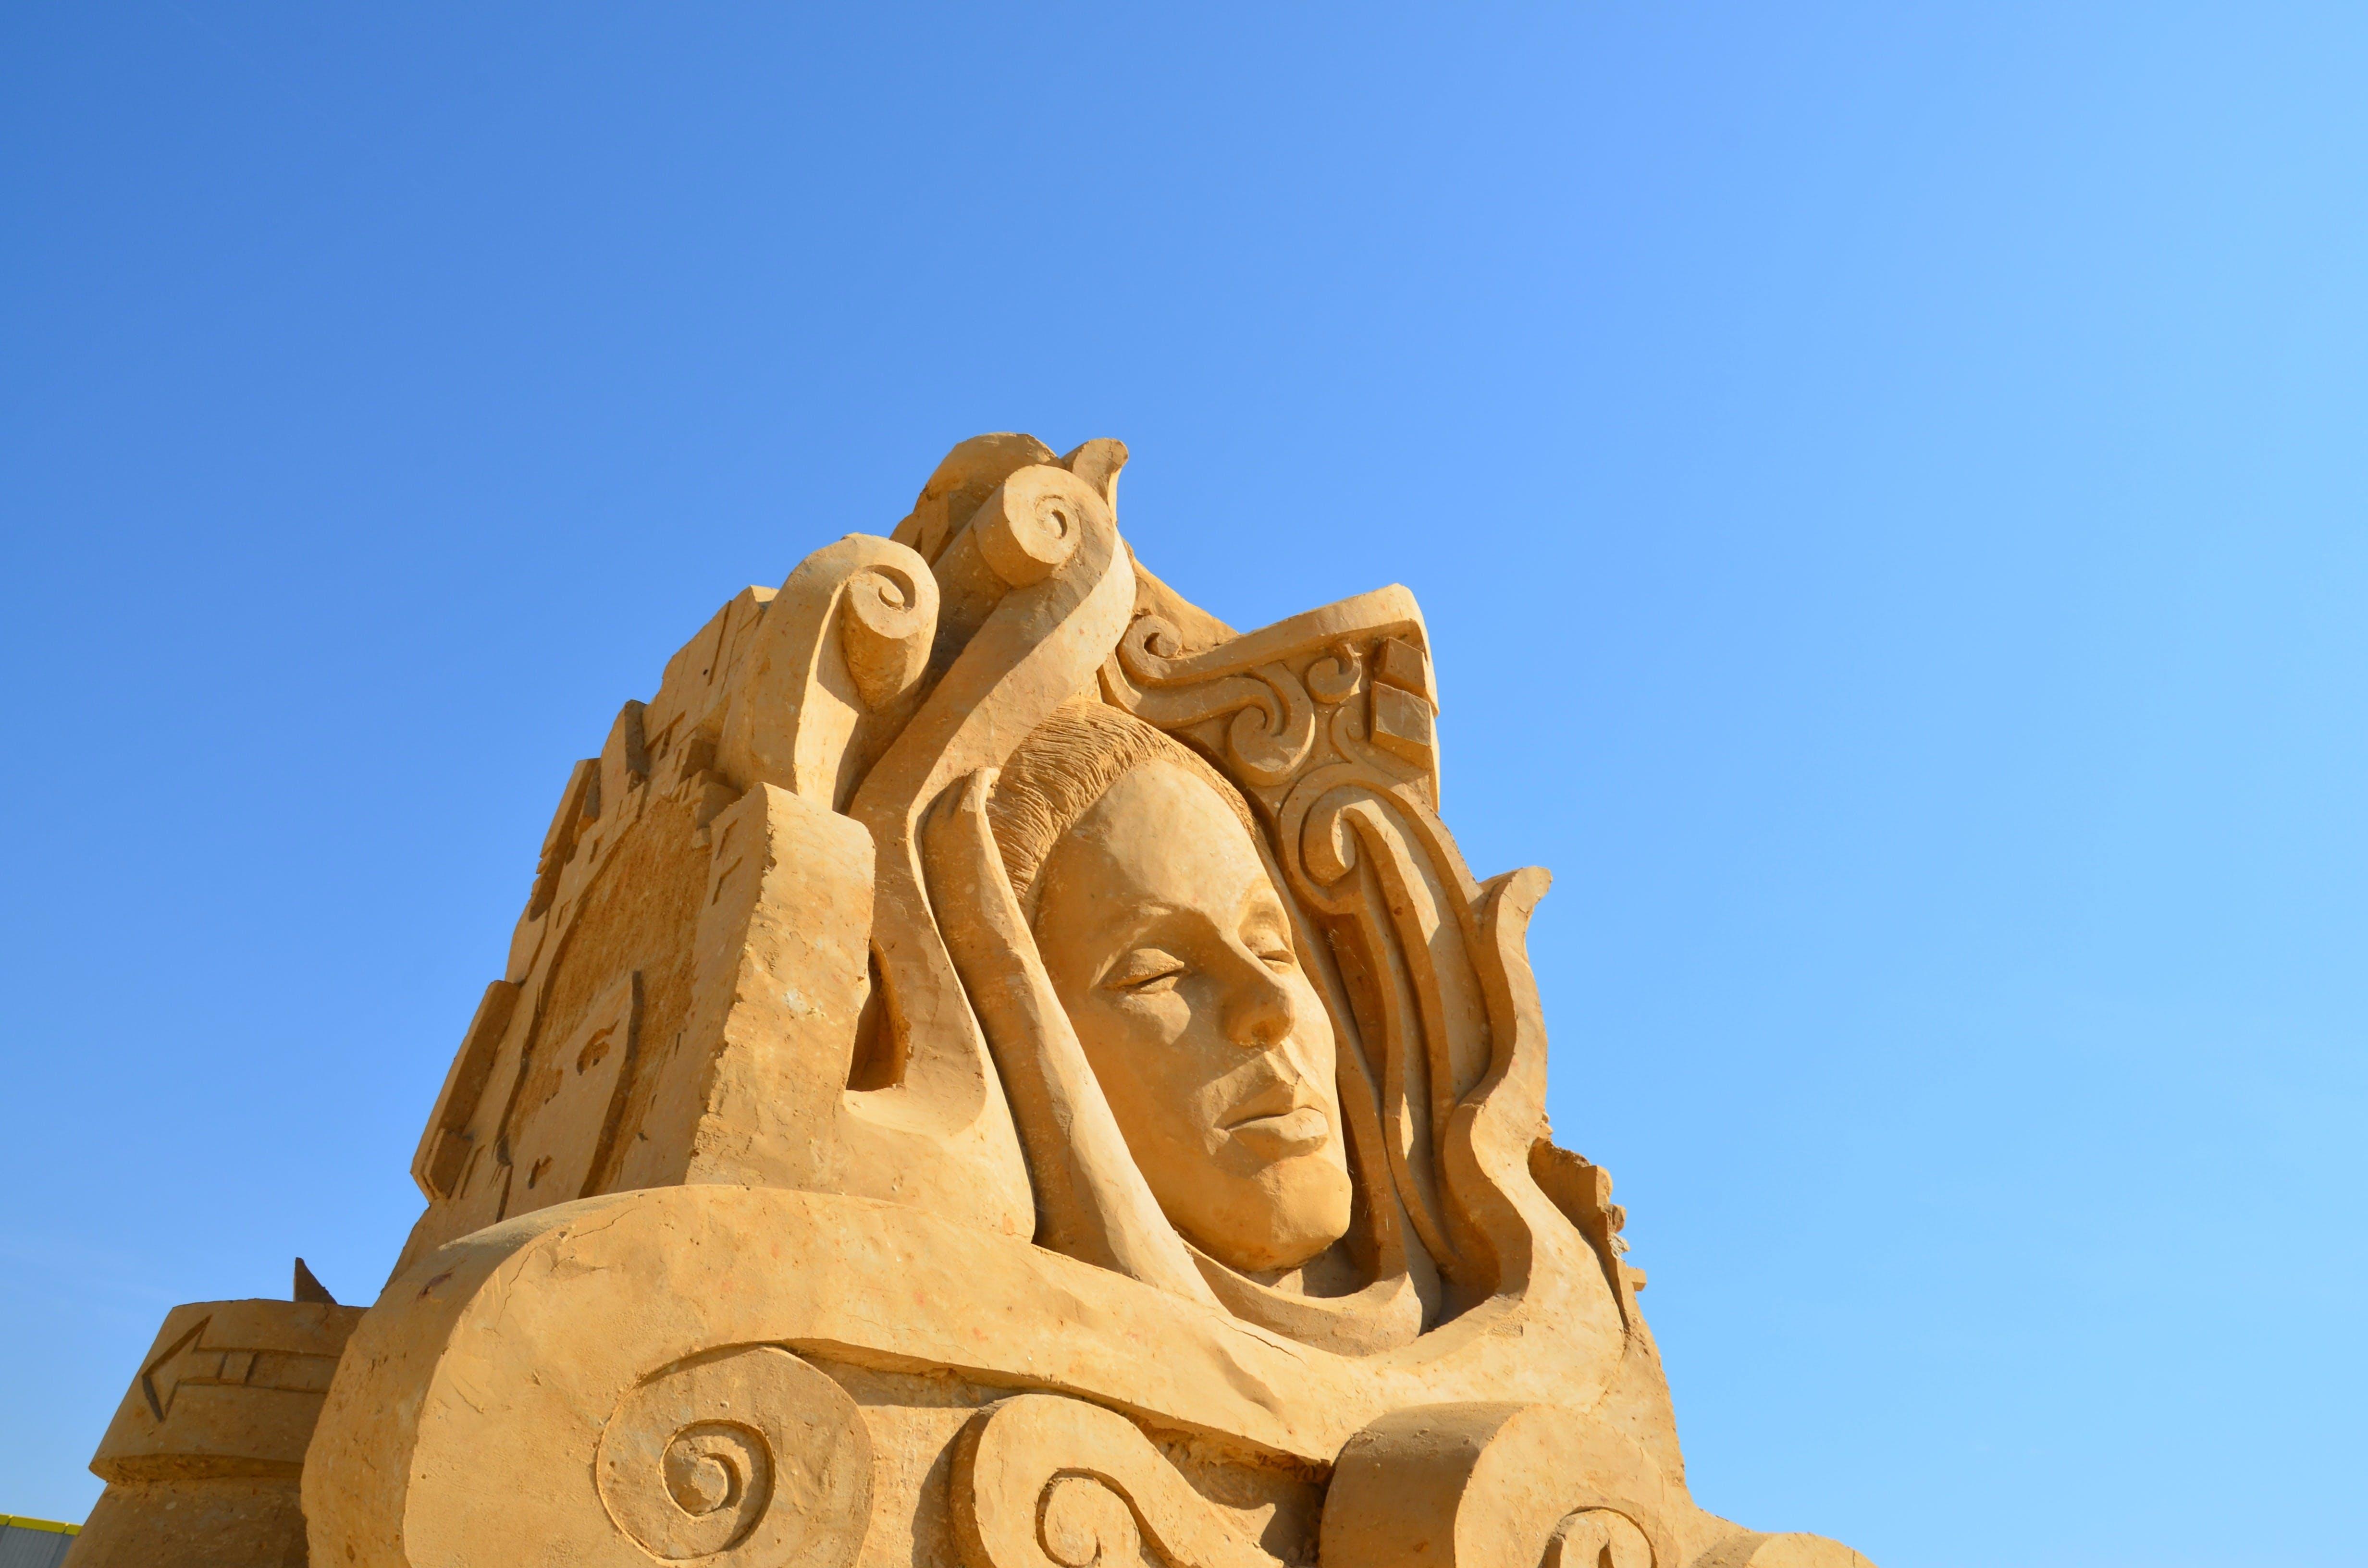 Female Sand Sculpture during Daytime